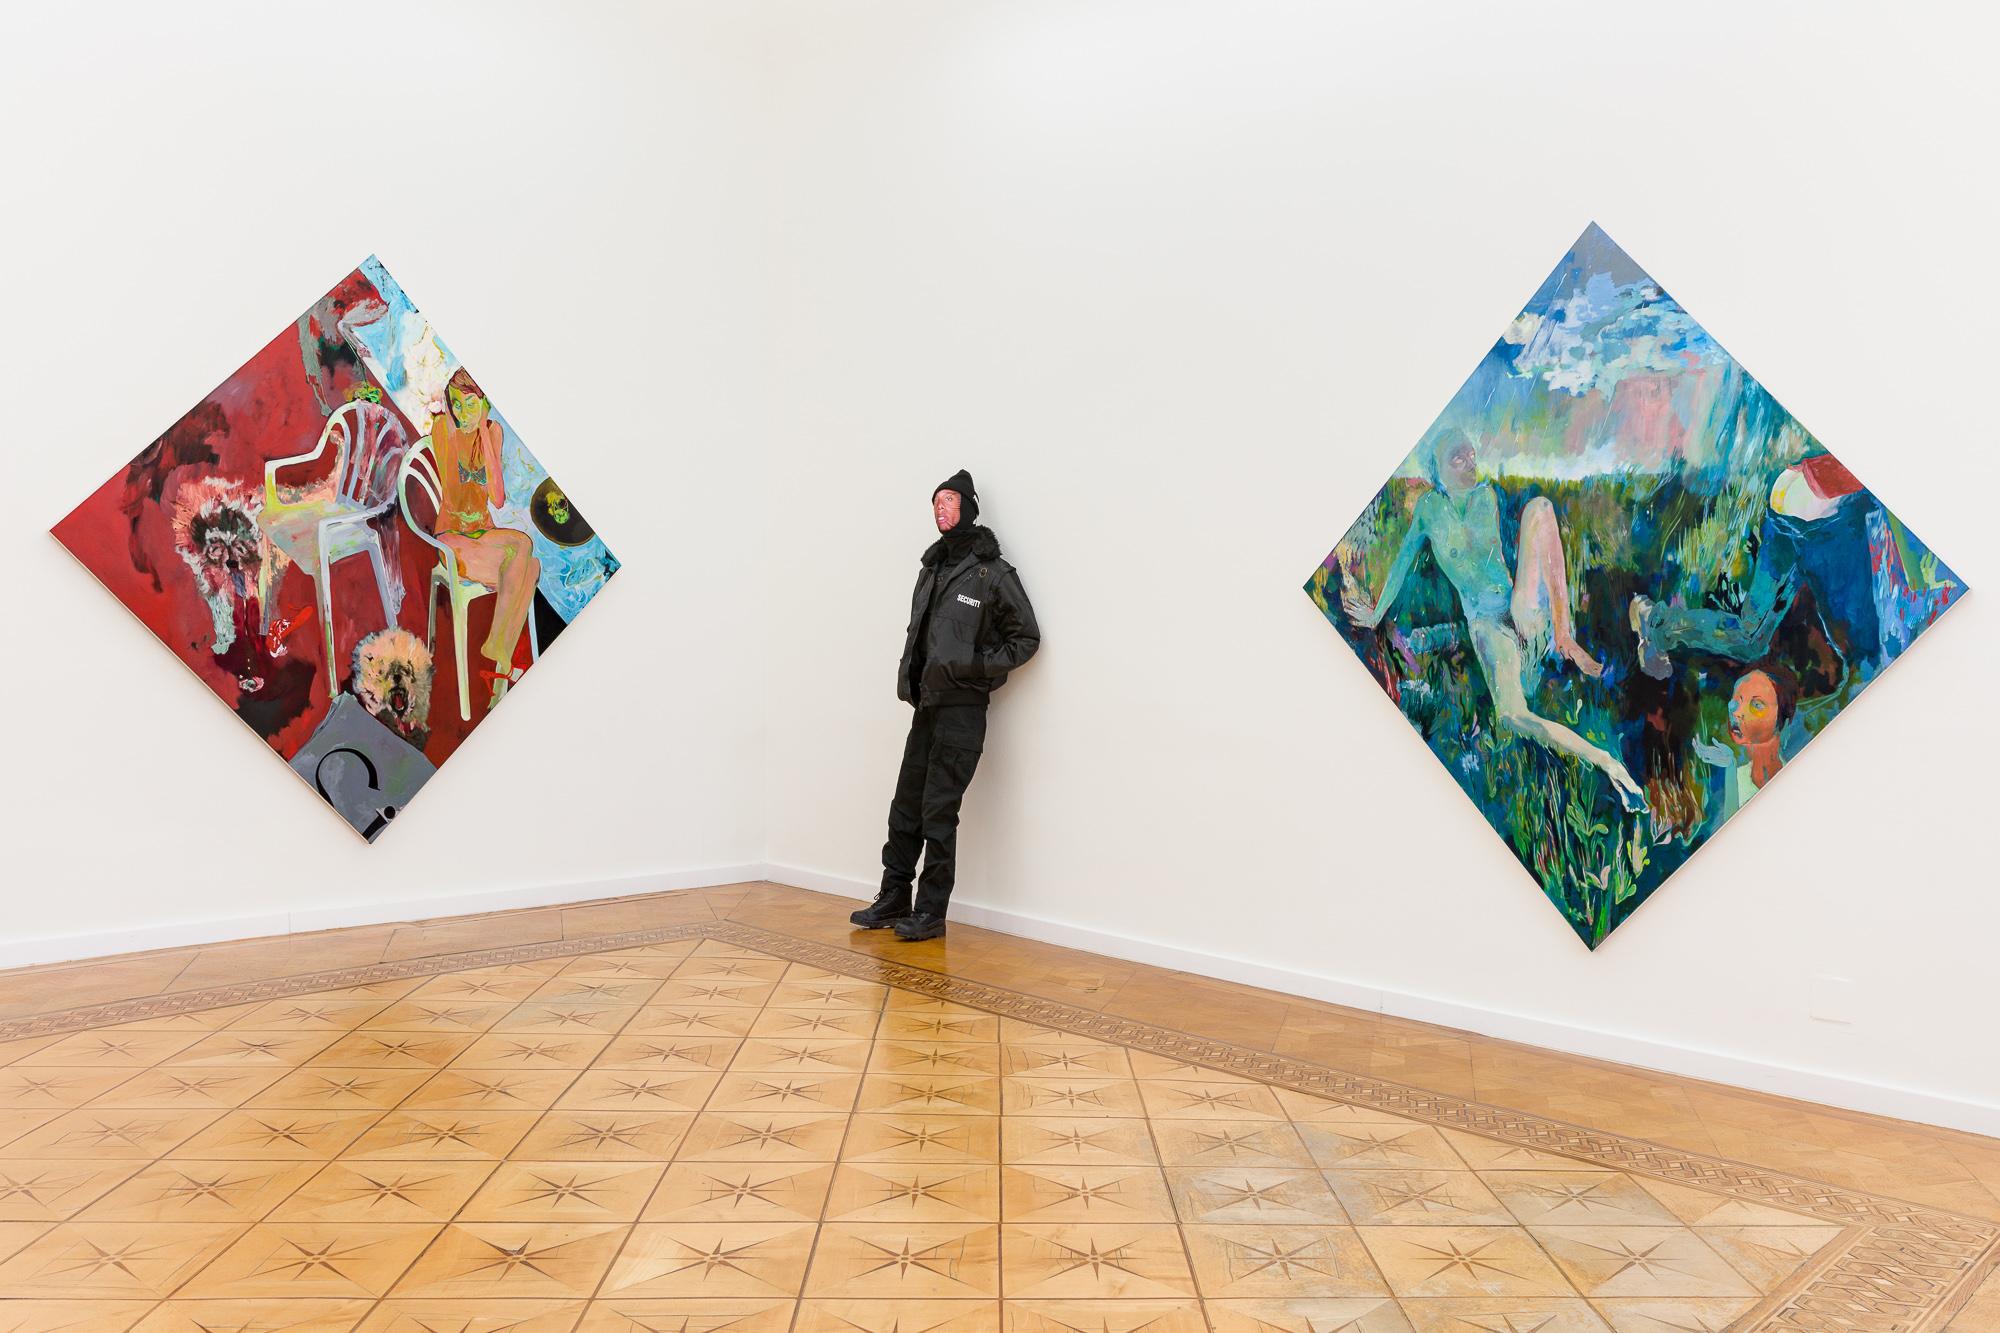 2019_01_28_Georgia Gardner Gray at Croy Nielsen by Kunstdokumentationcom_v3_005_web.jpg